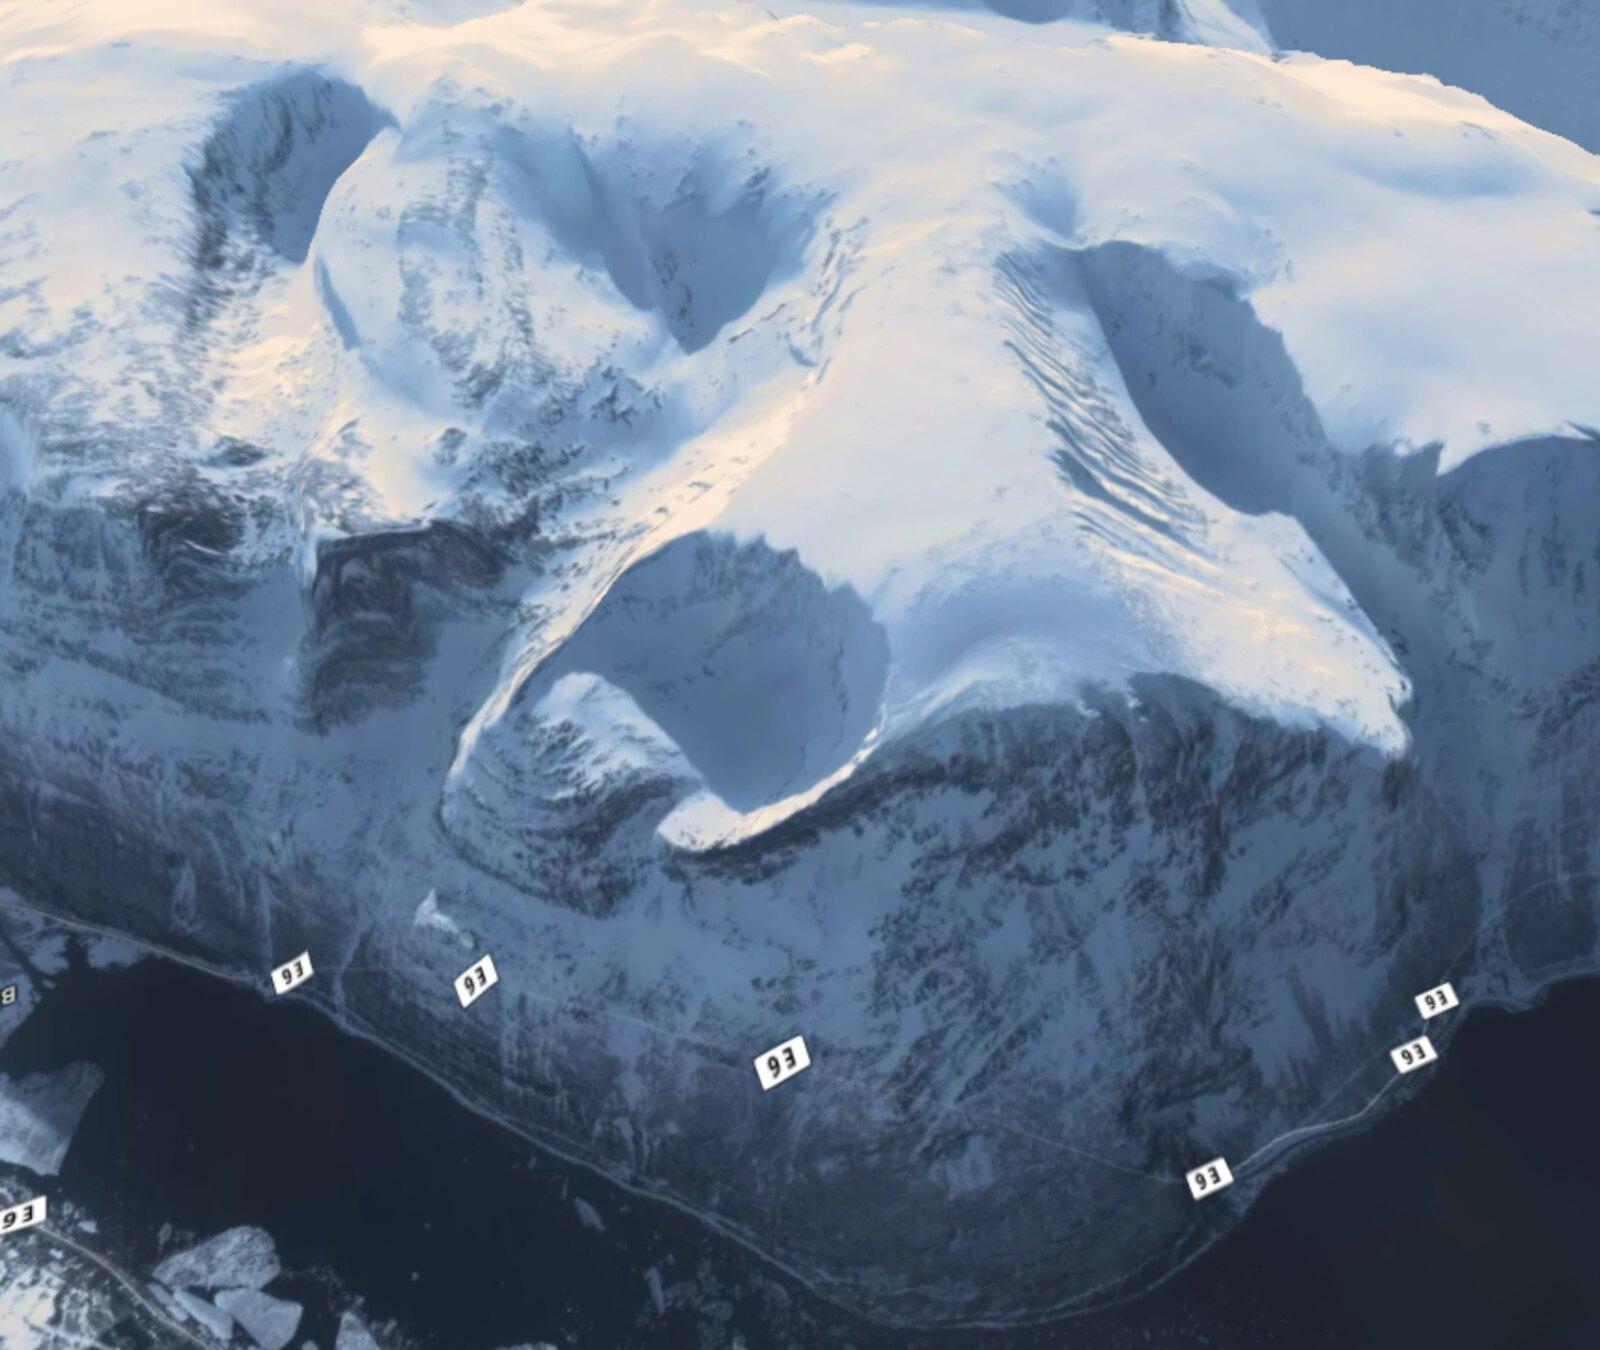 Icy elevation